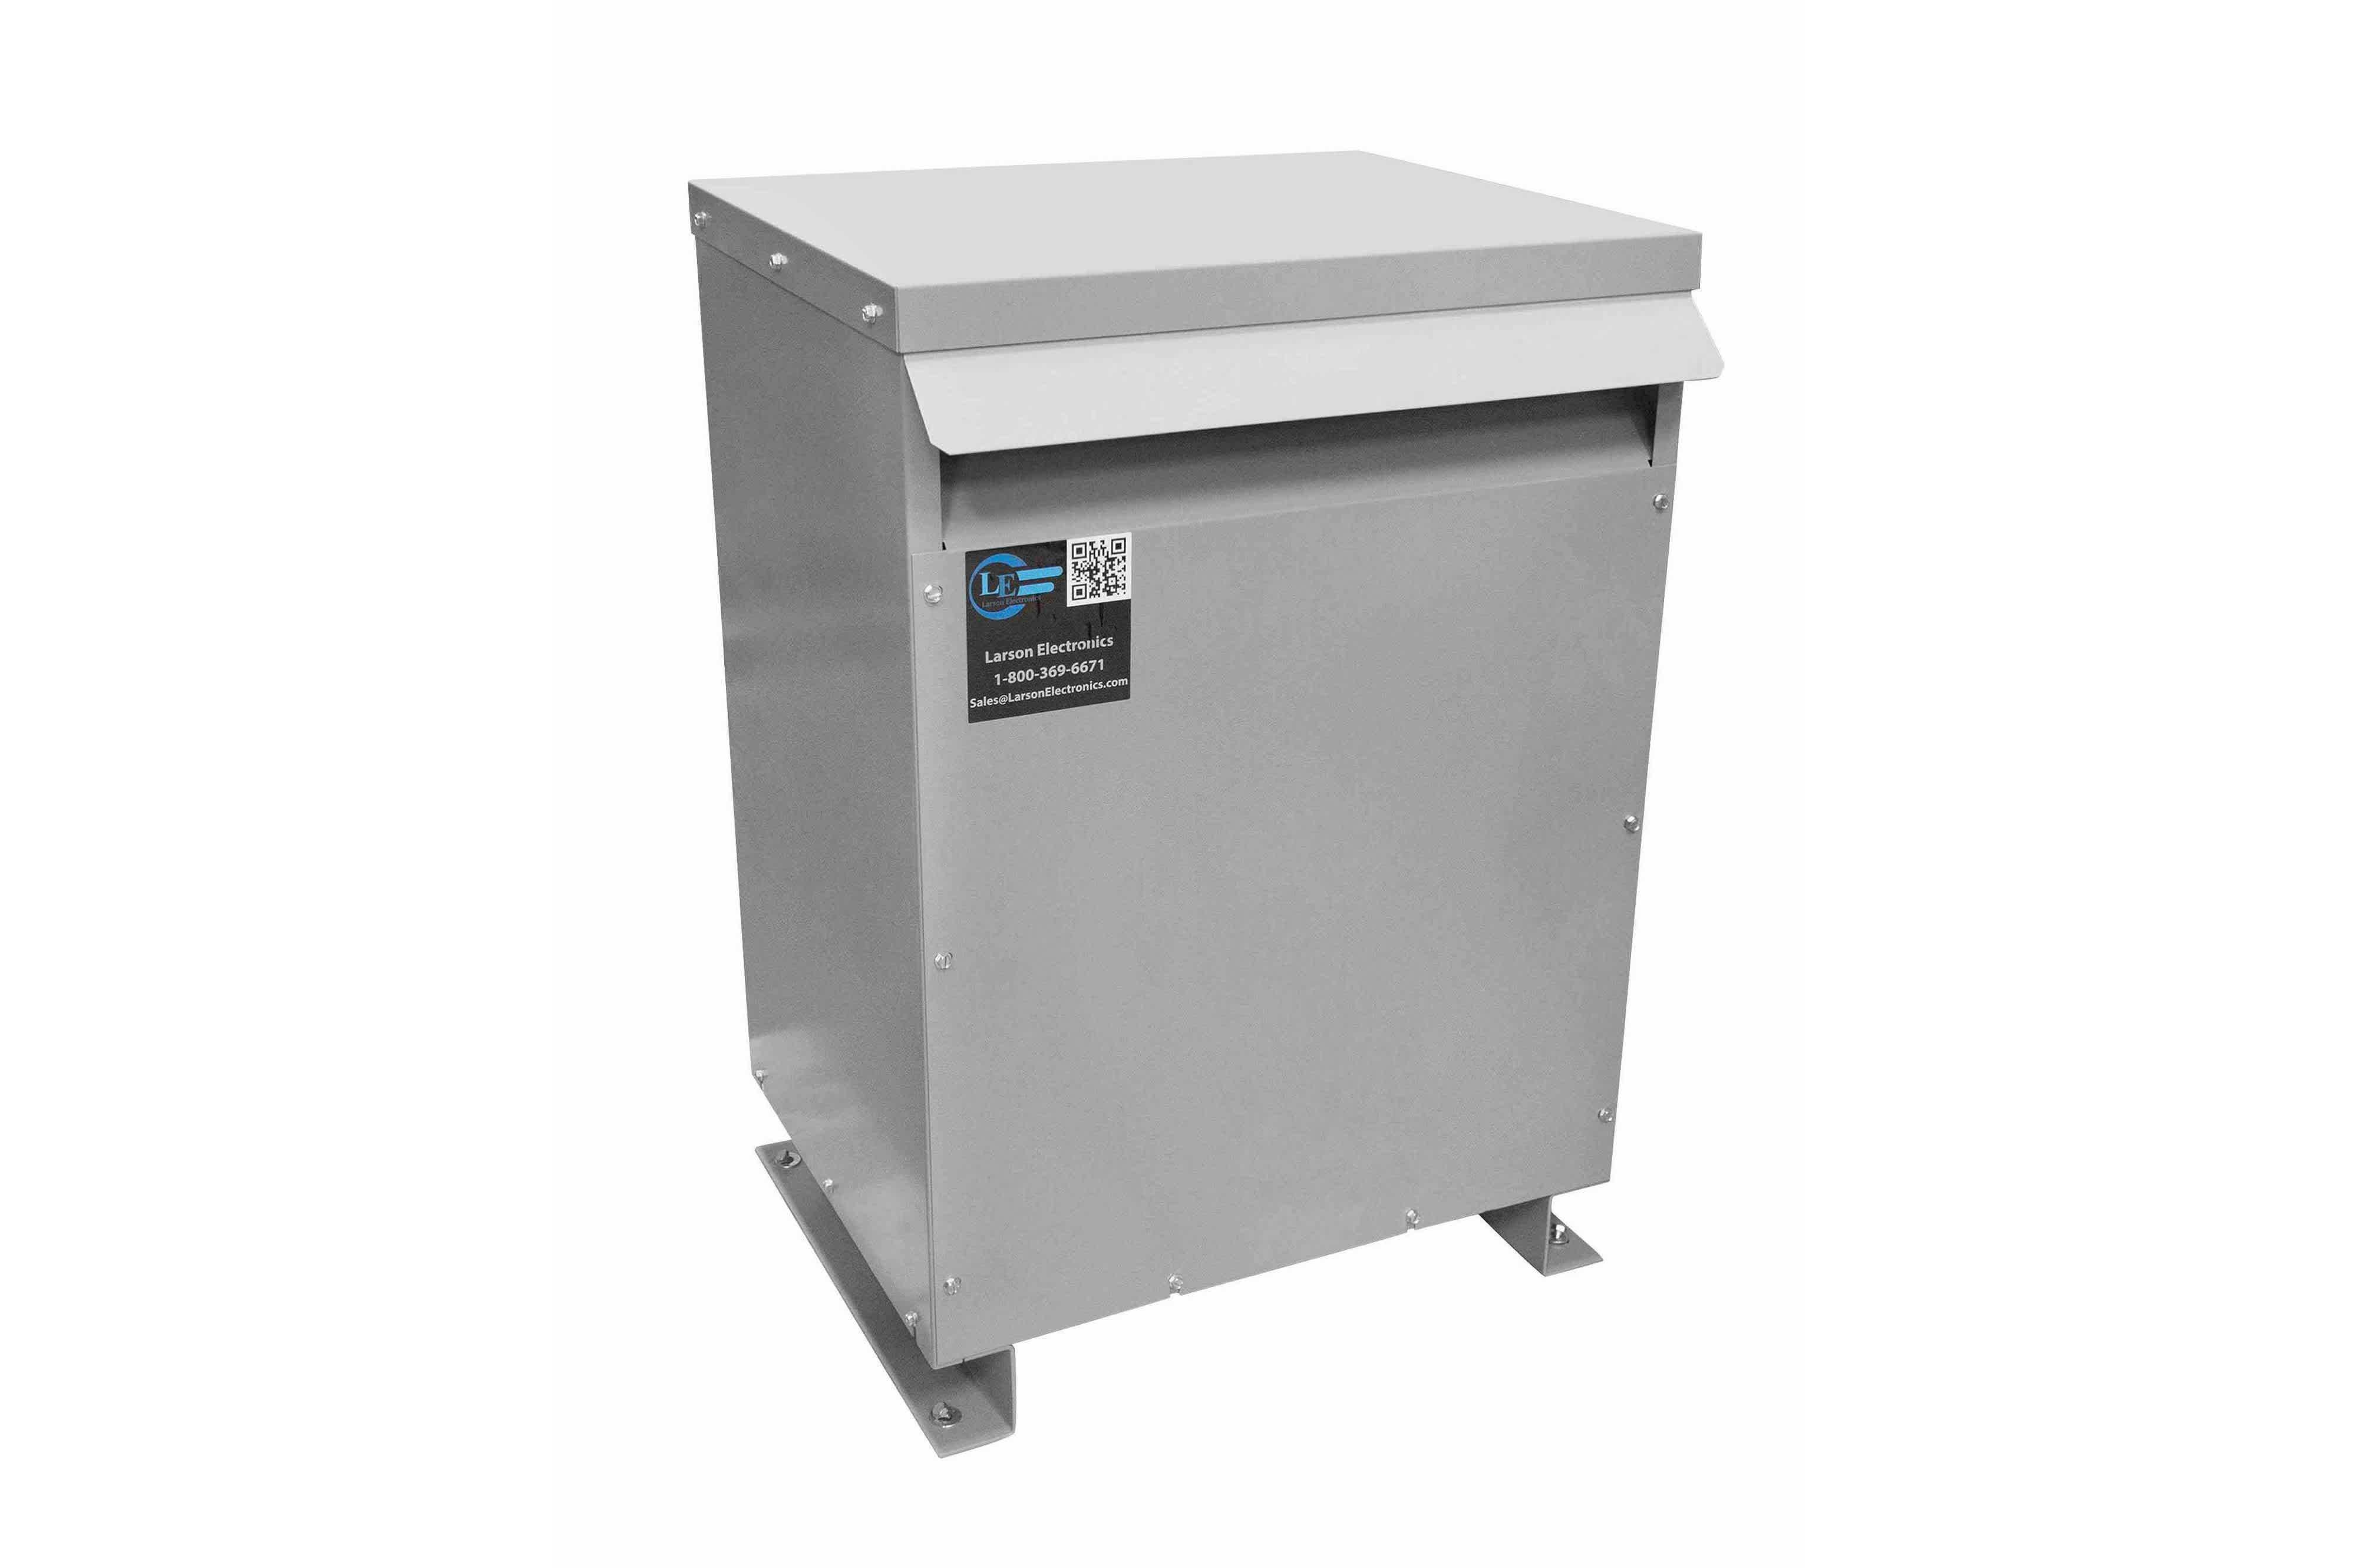 900 kVA 3PH Isolation Transformer, 460V Wye Primary, 415V Delta Secondary, N3R, Ventilated, 60 Hz